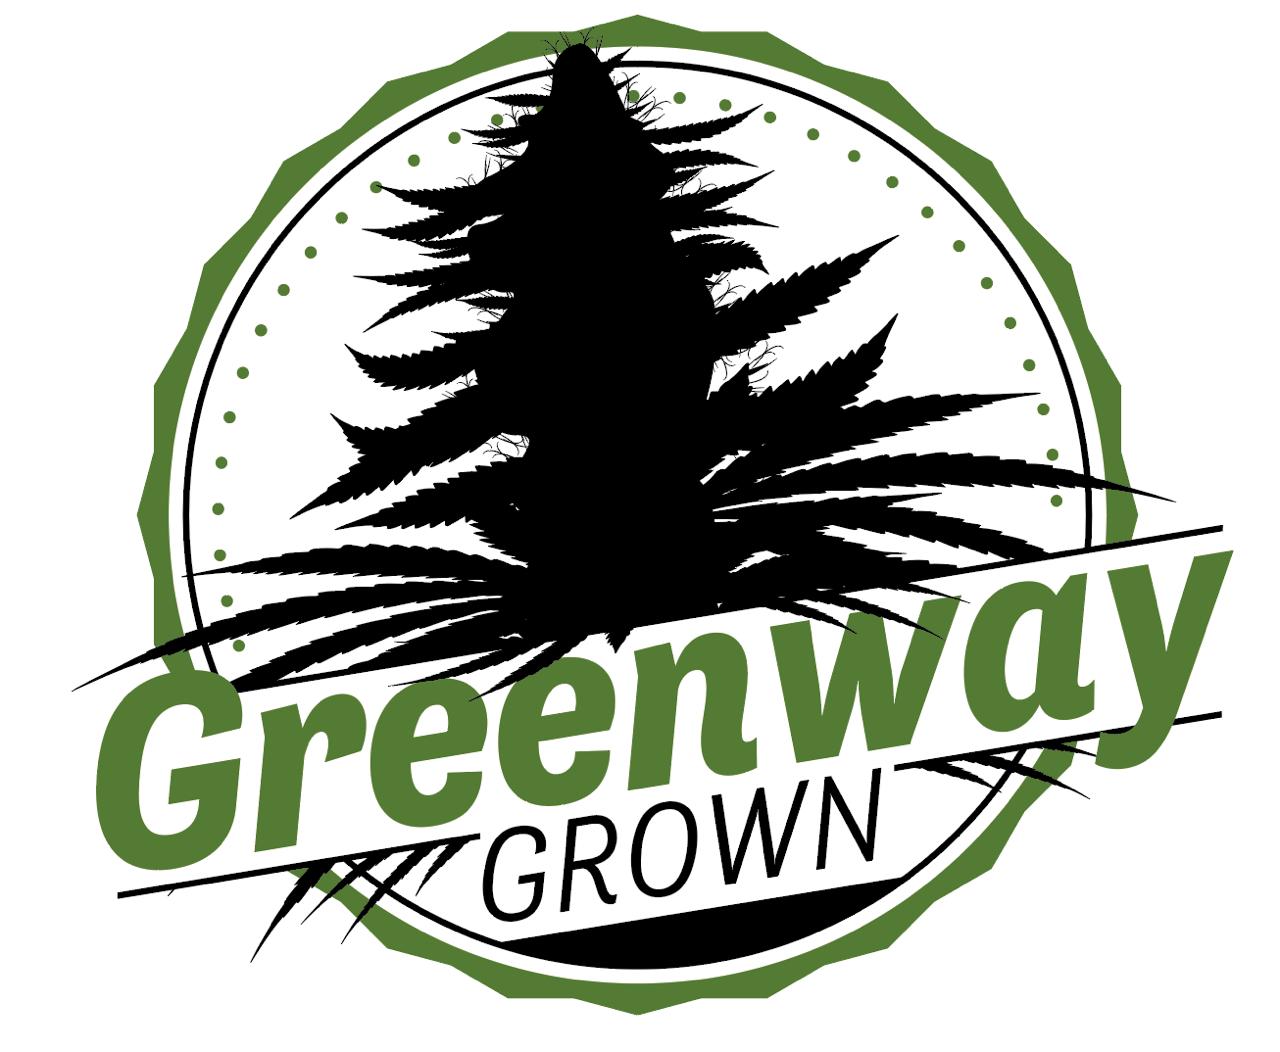 Greenway Grown